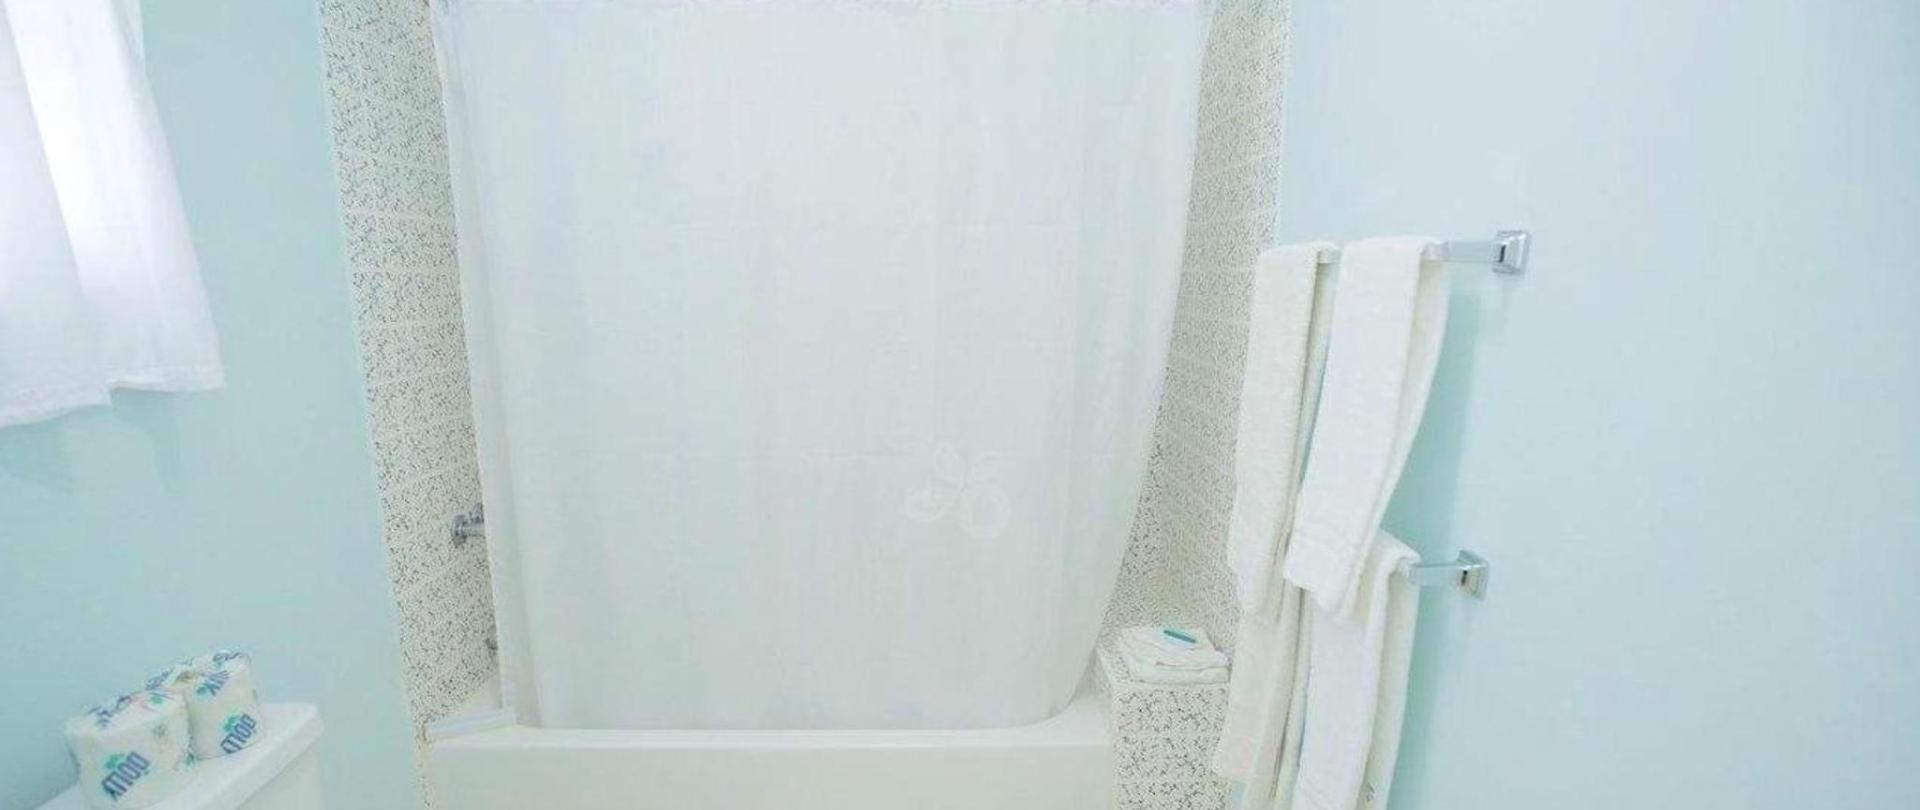 Bath Vistalmar Aruba Accommodation.jpg